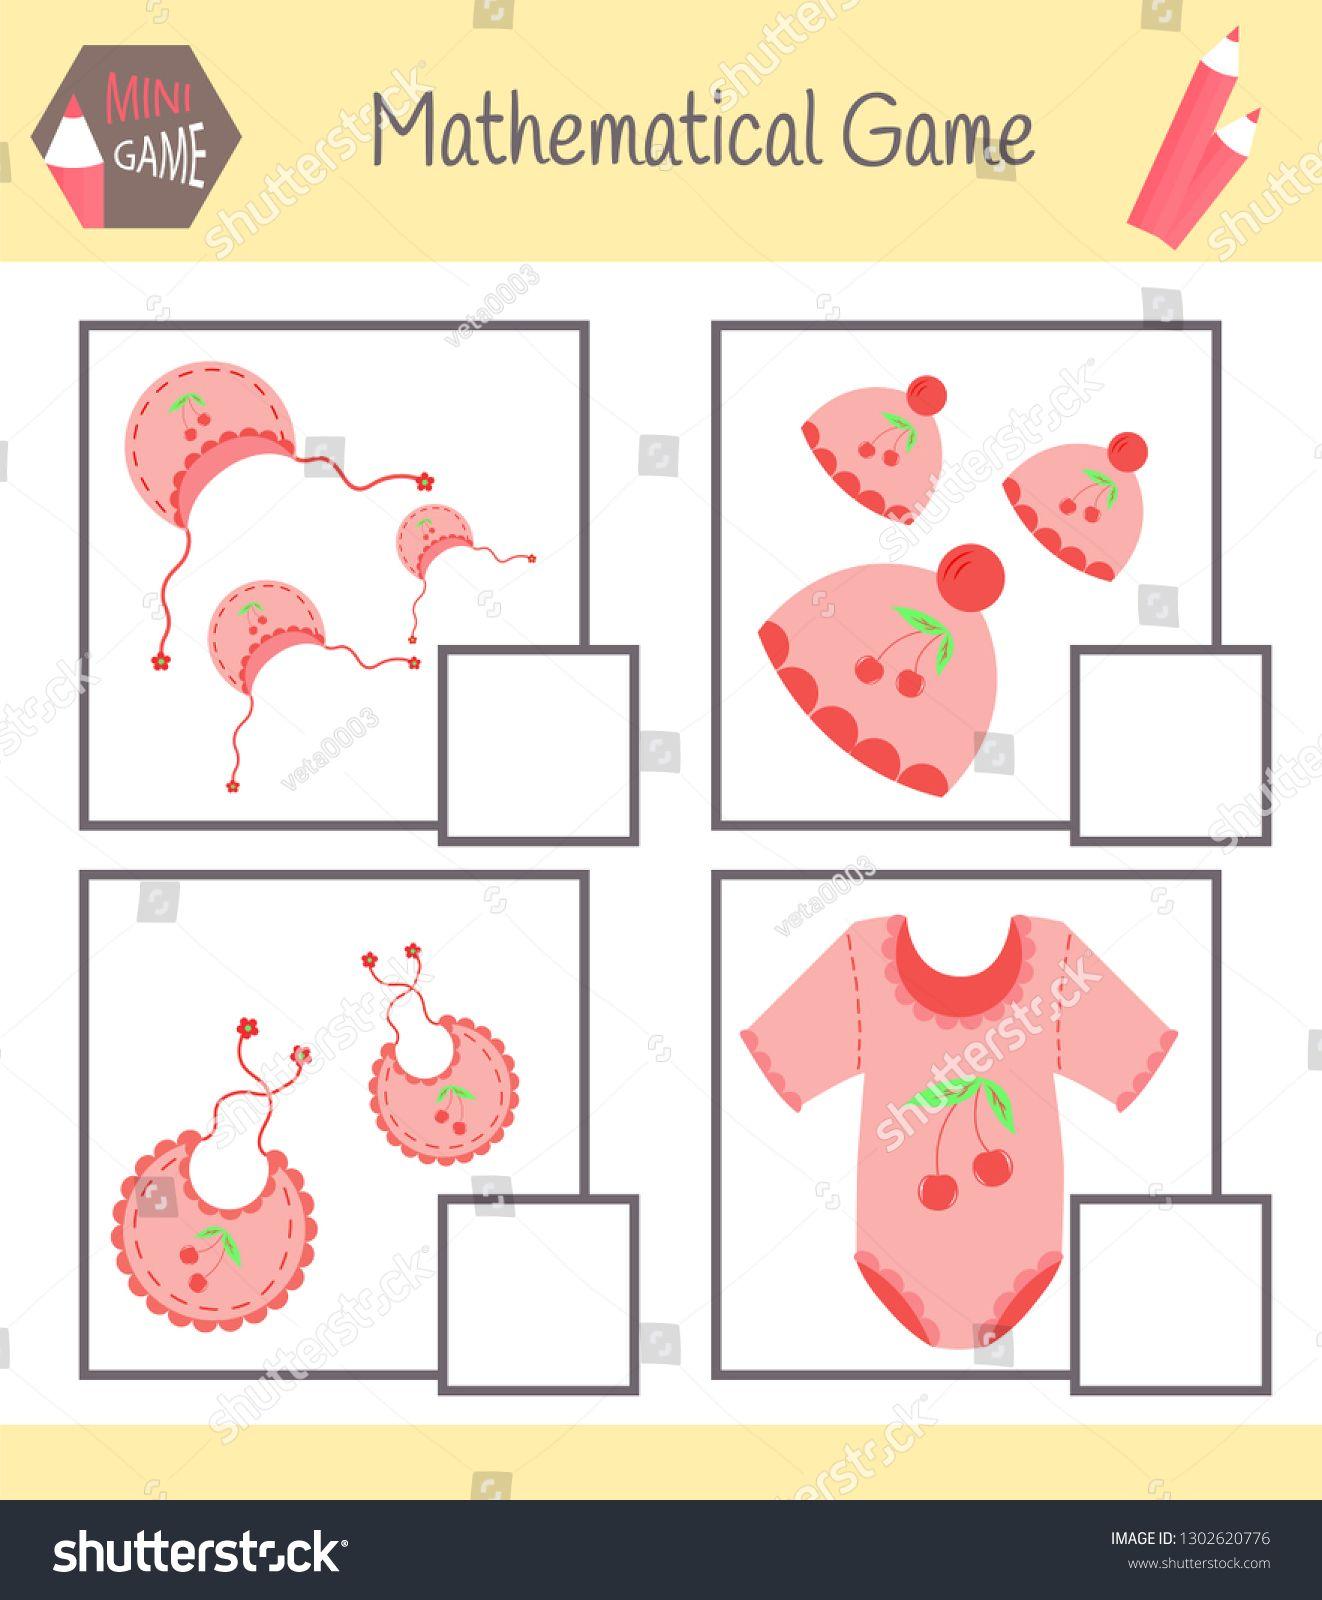 Workbook On Mathematics For Preschool Education Puzzles